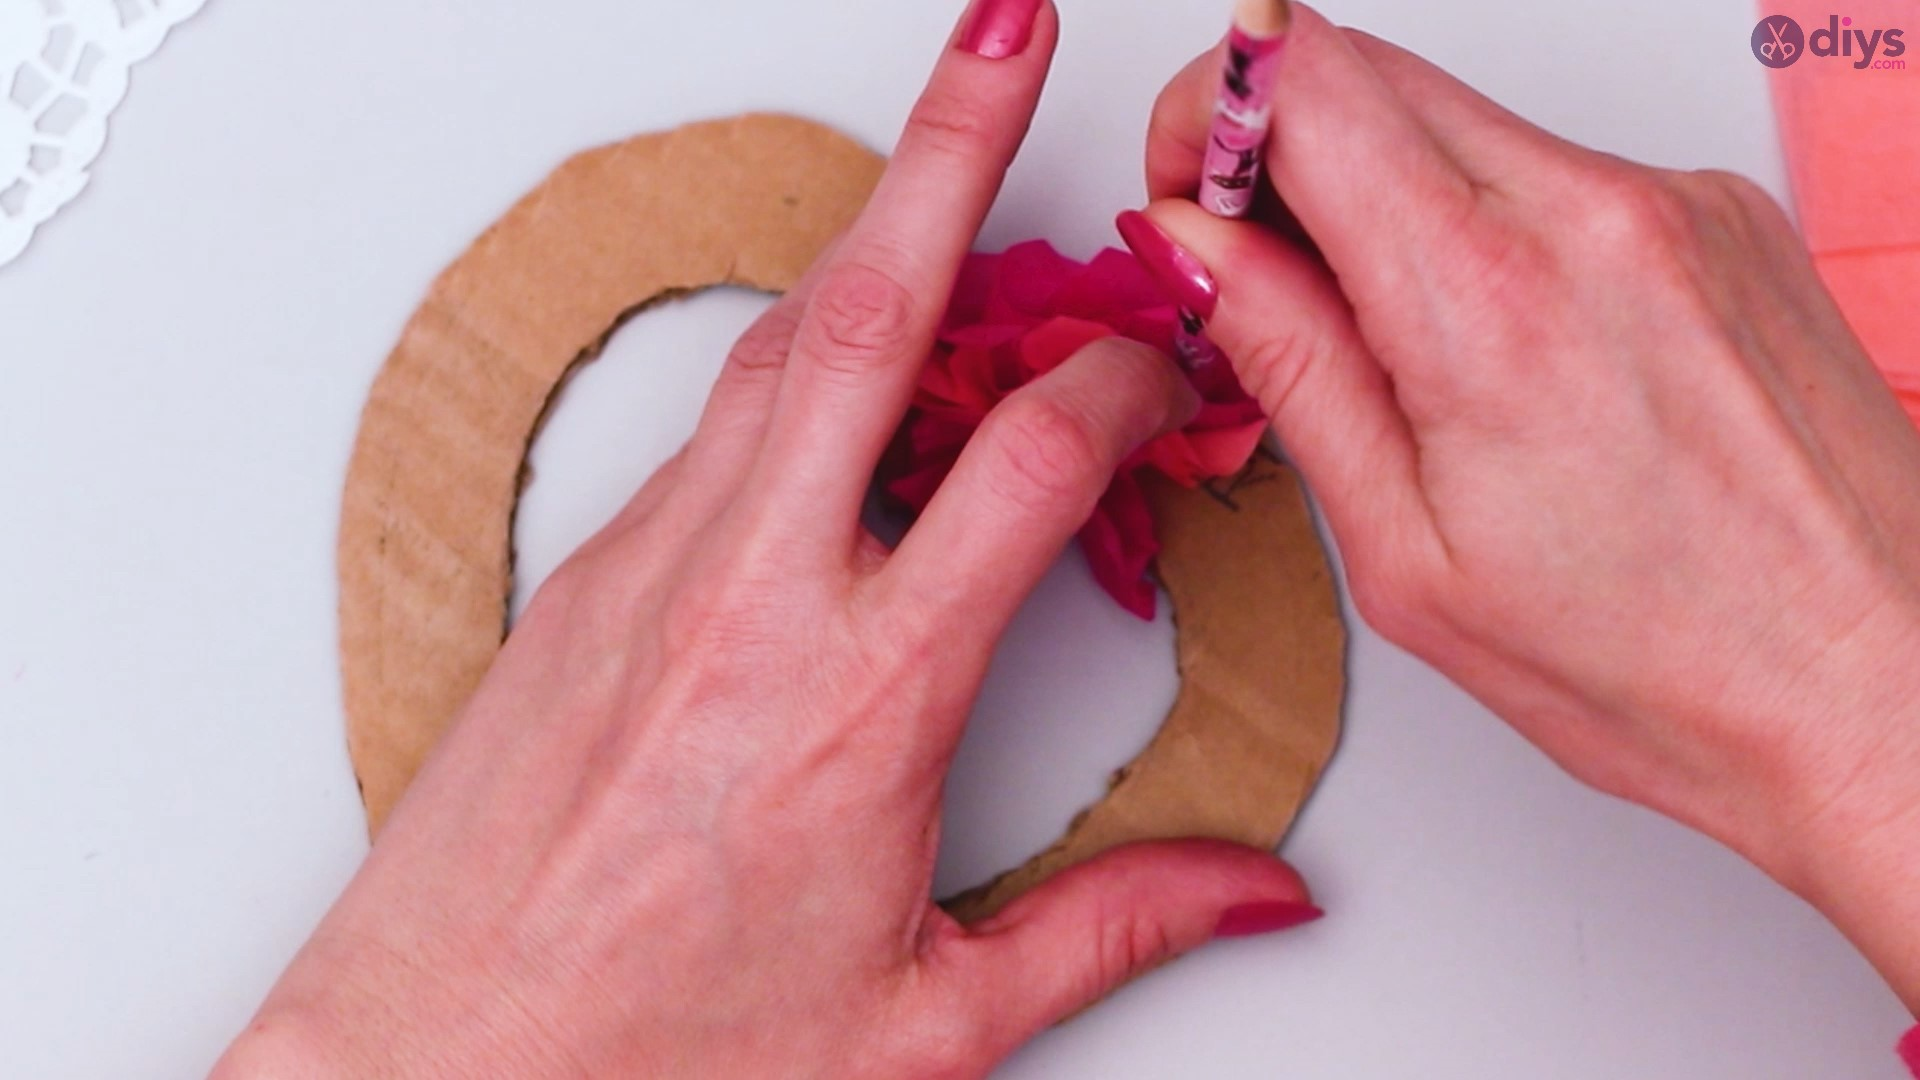 Diy tissue paper puffy heart step 1 (21)